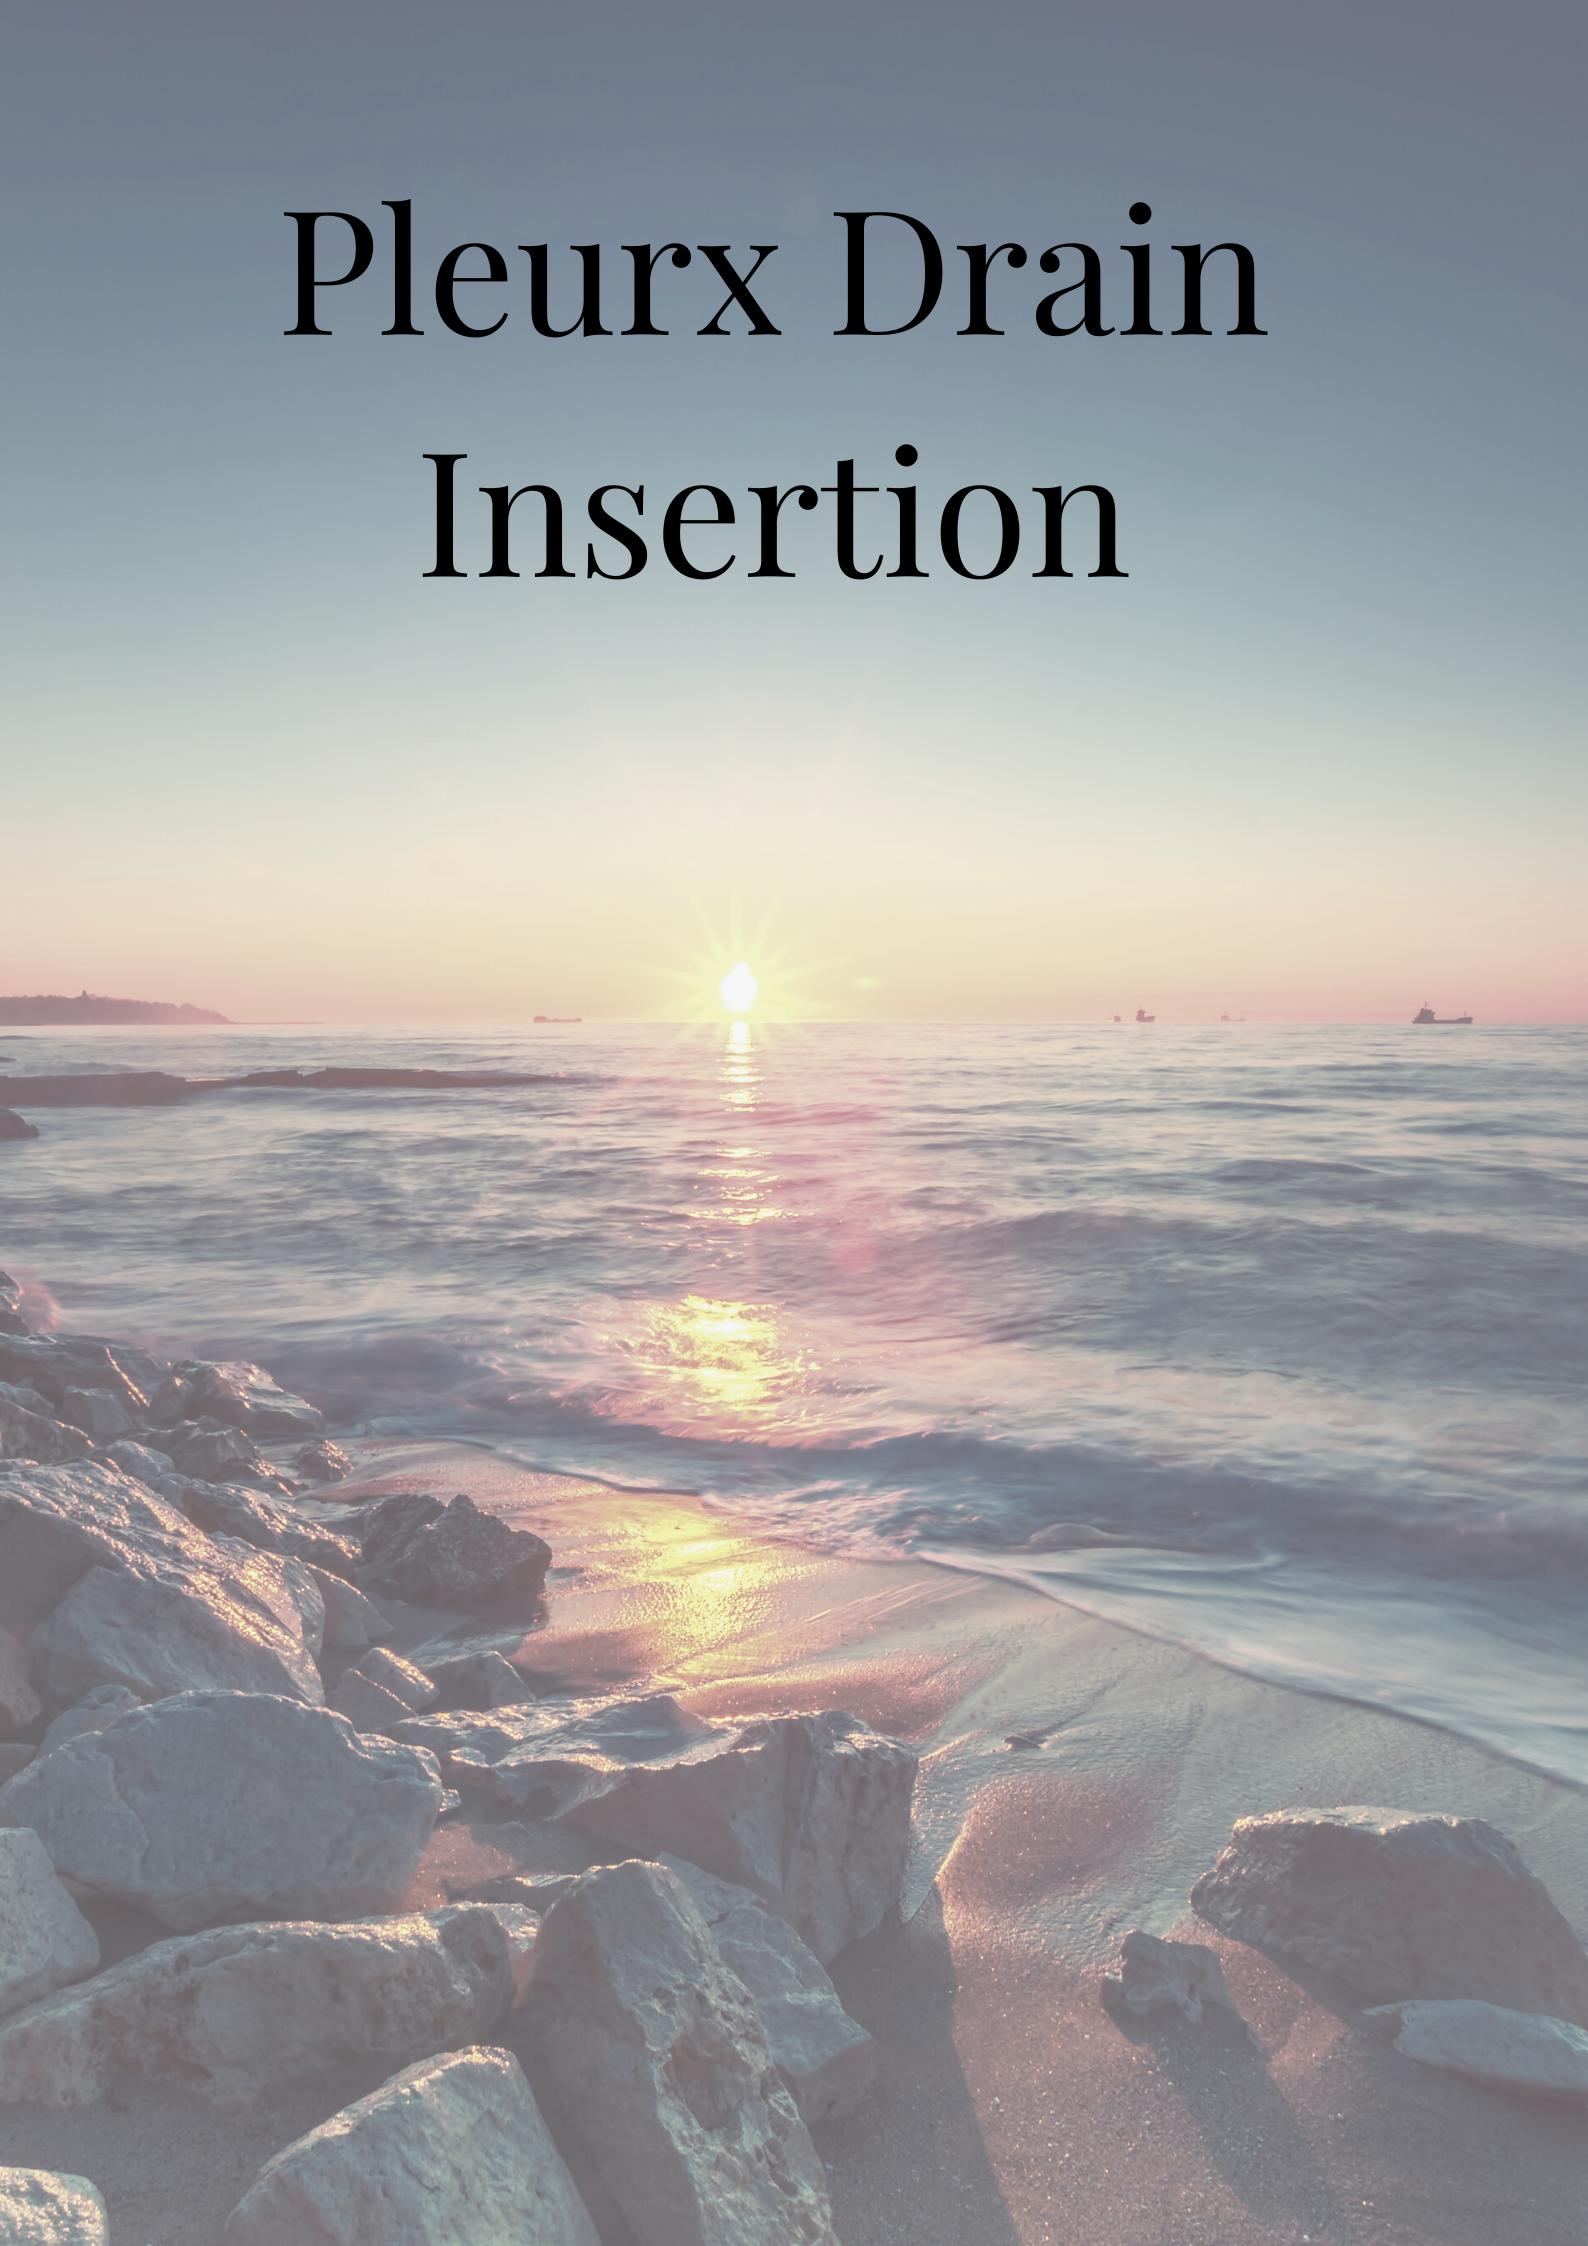 Pleurx Drain Insertion